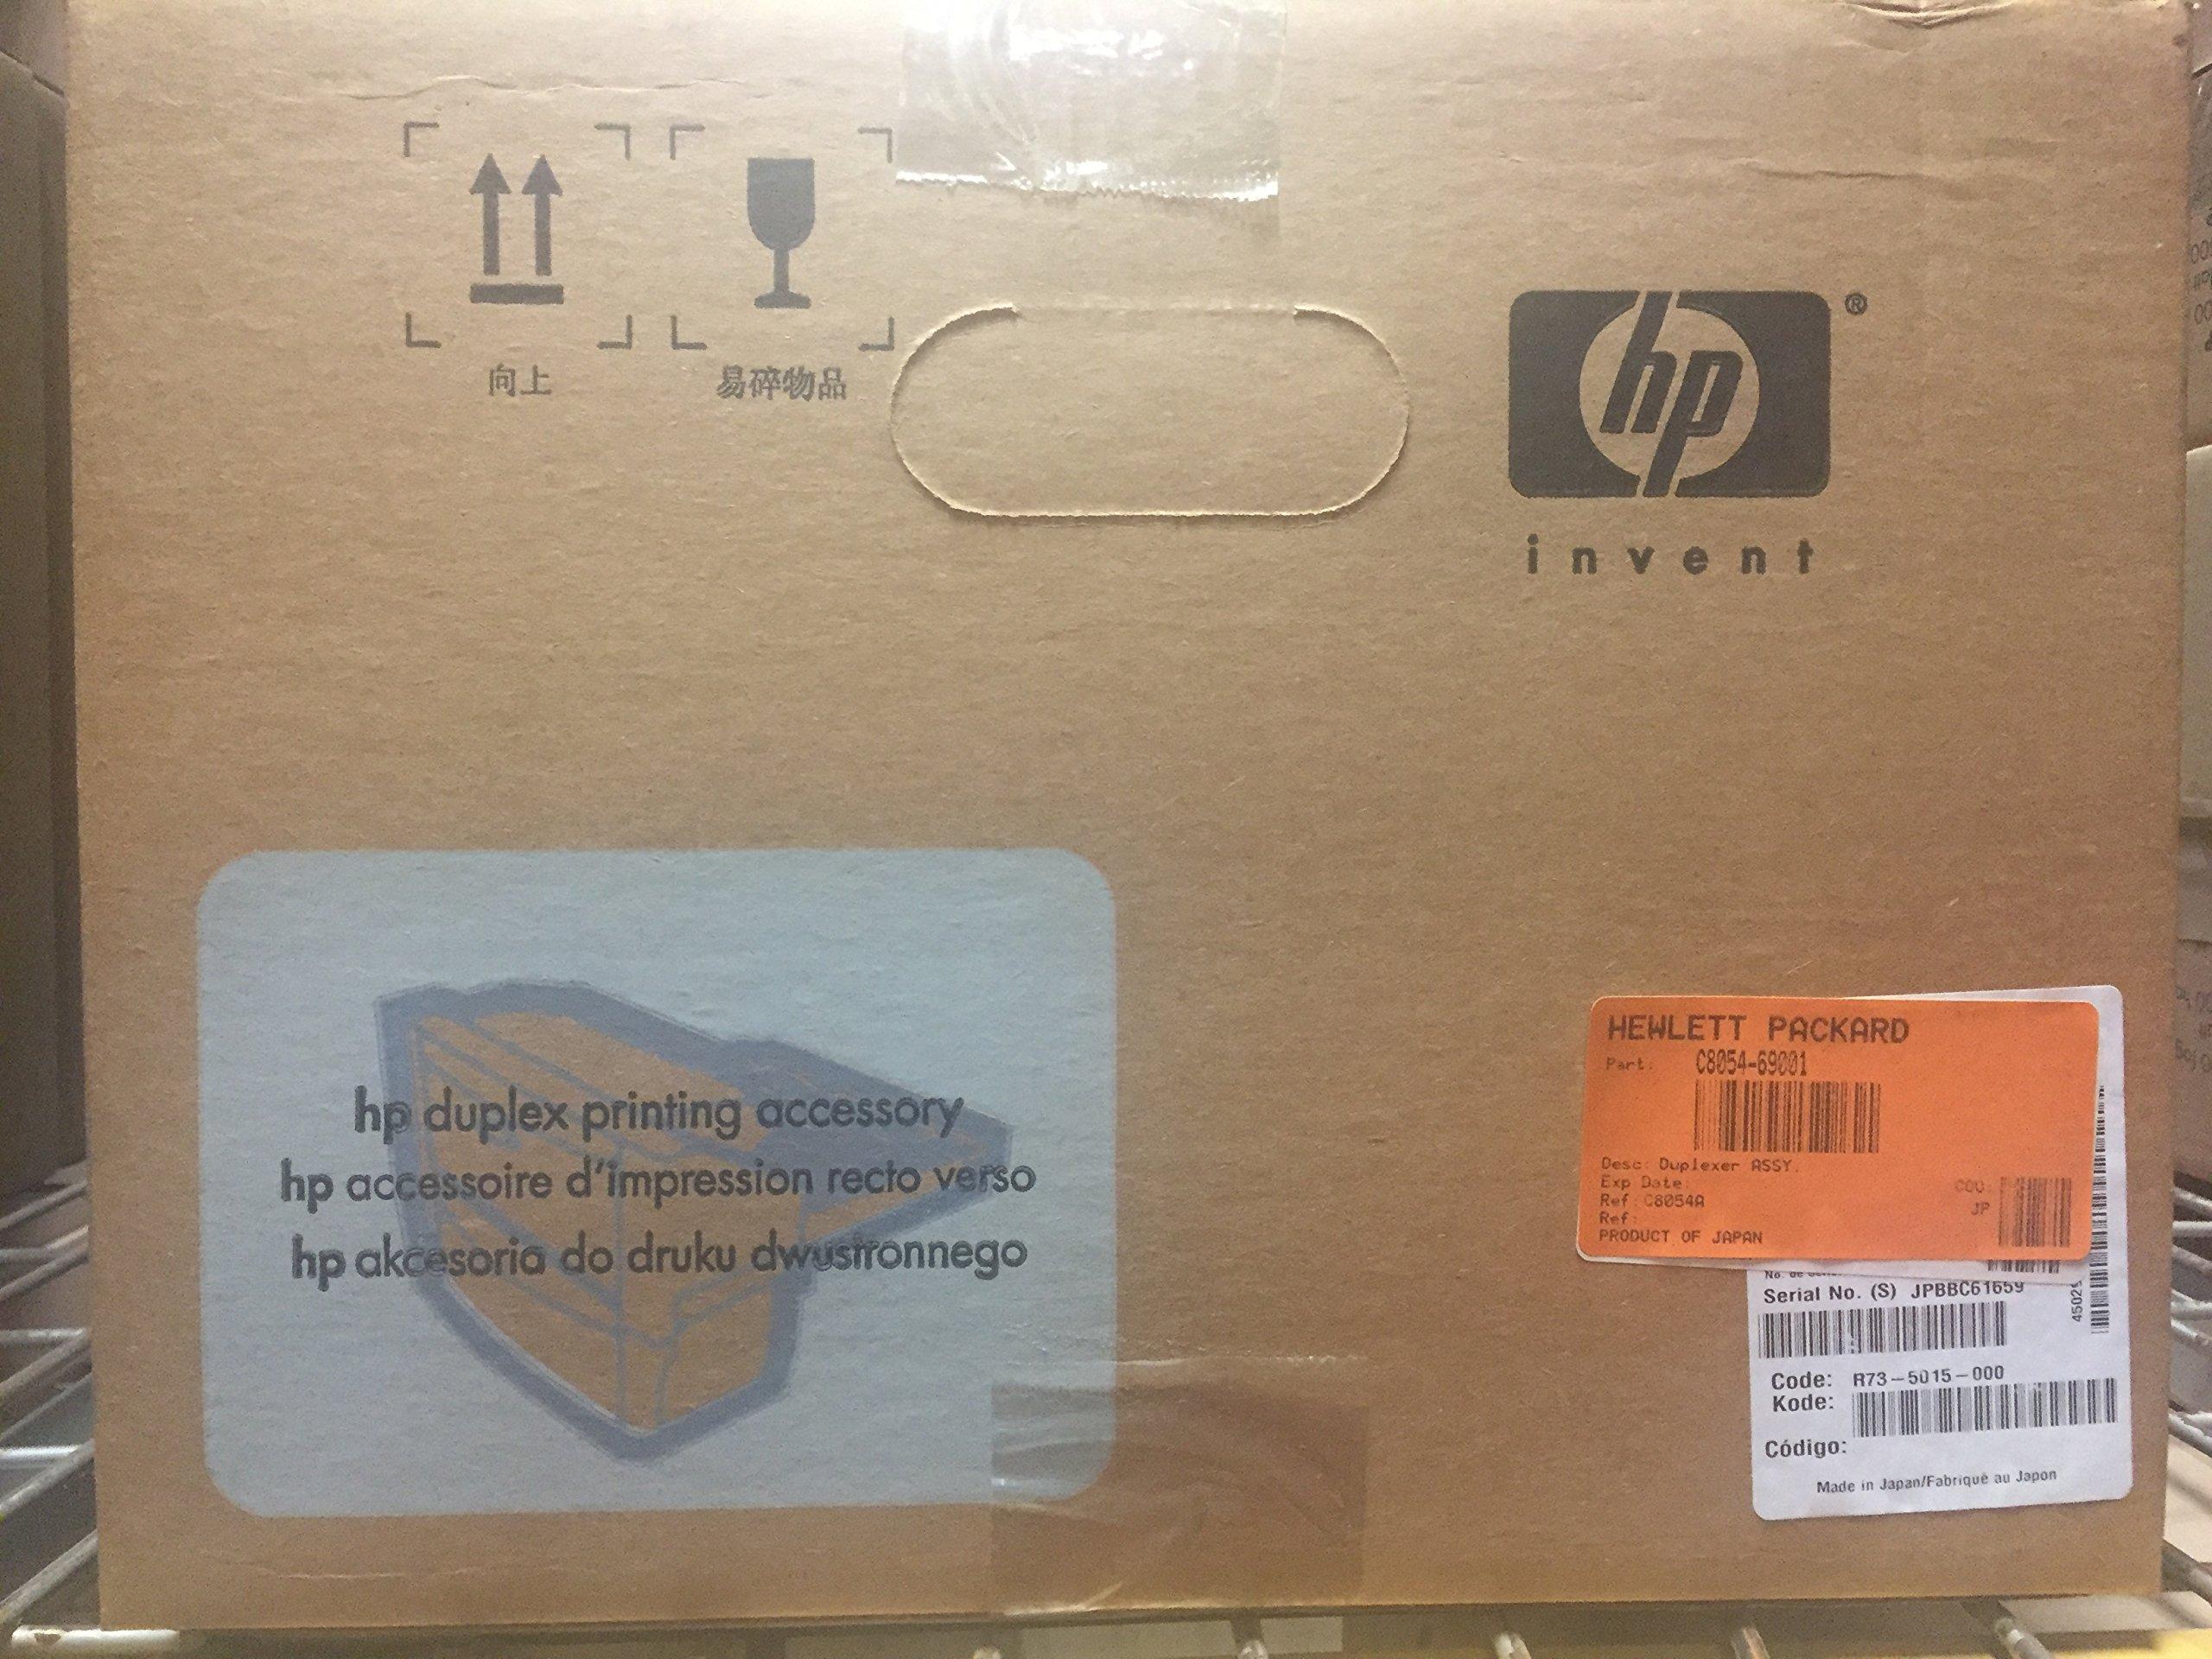 Hewlett Packard C8054A Duplex Unit fot 2-Sided Printing on 4100 Series by HP